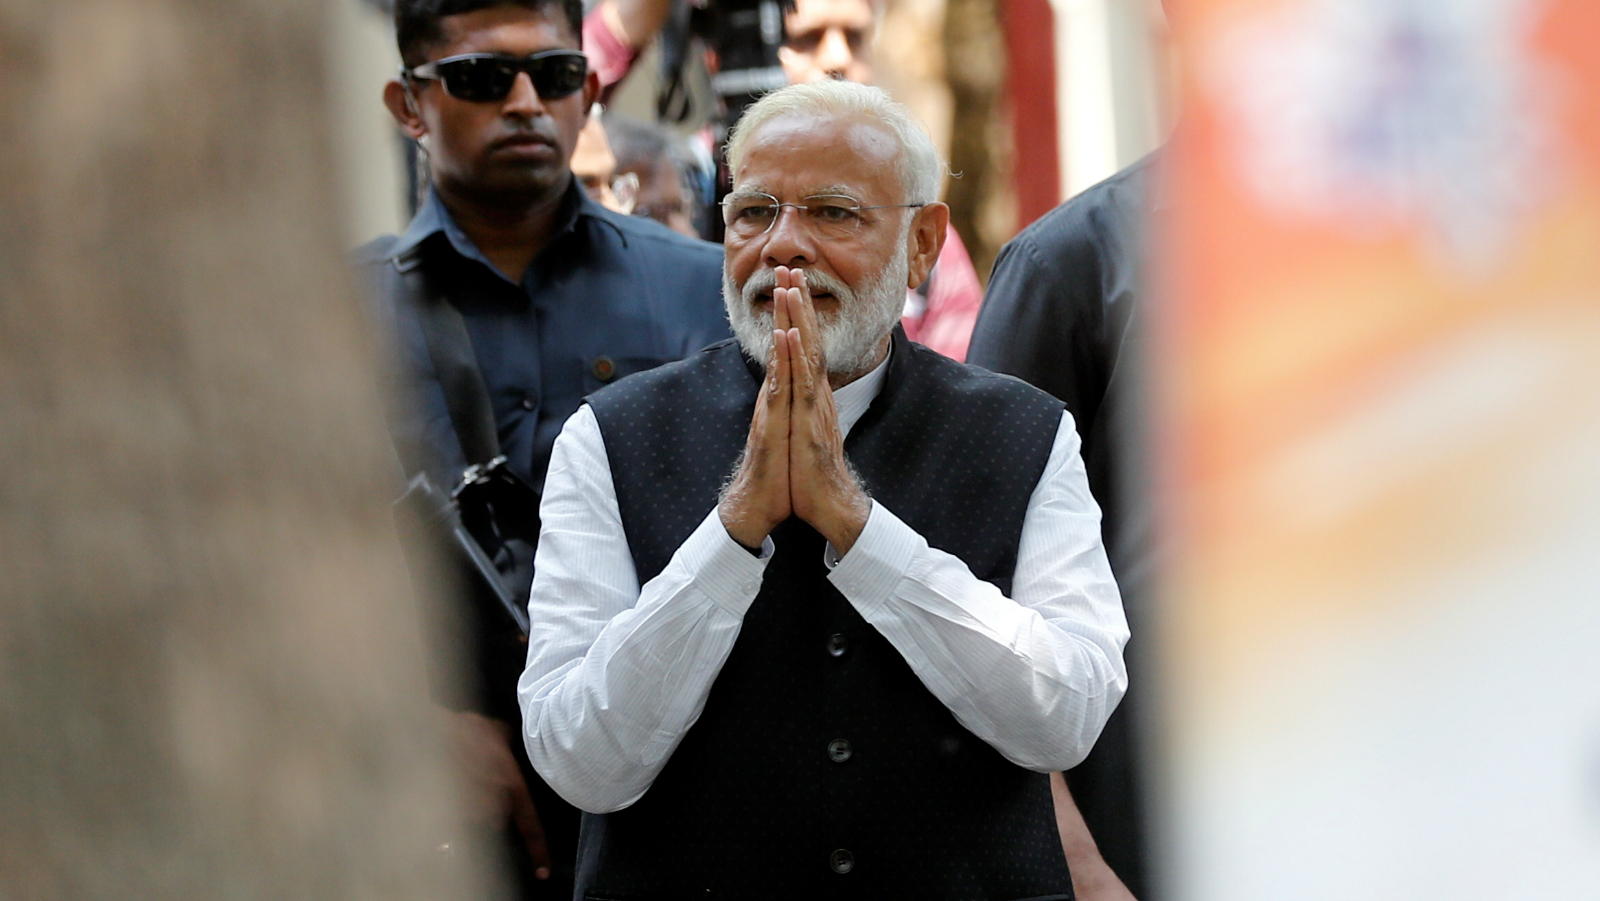 Mayawati, Mamata, Rahul eye Modi's chair this Indian election